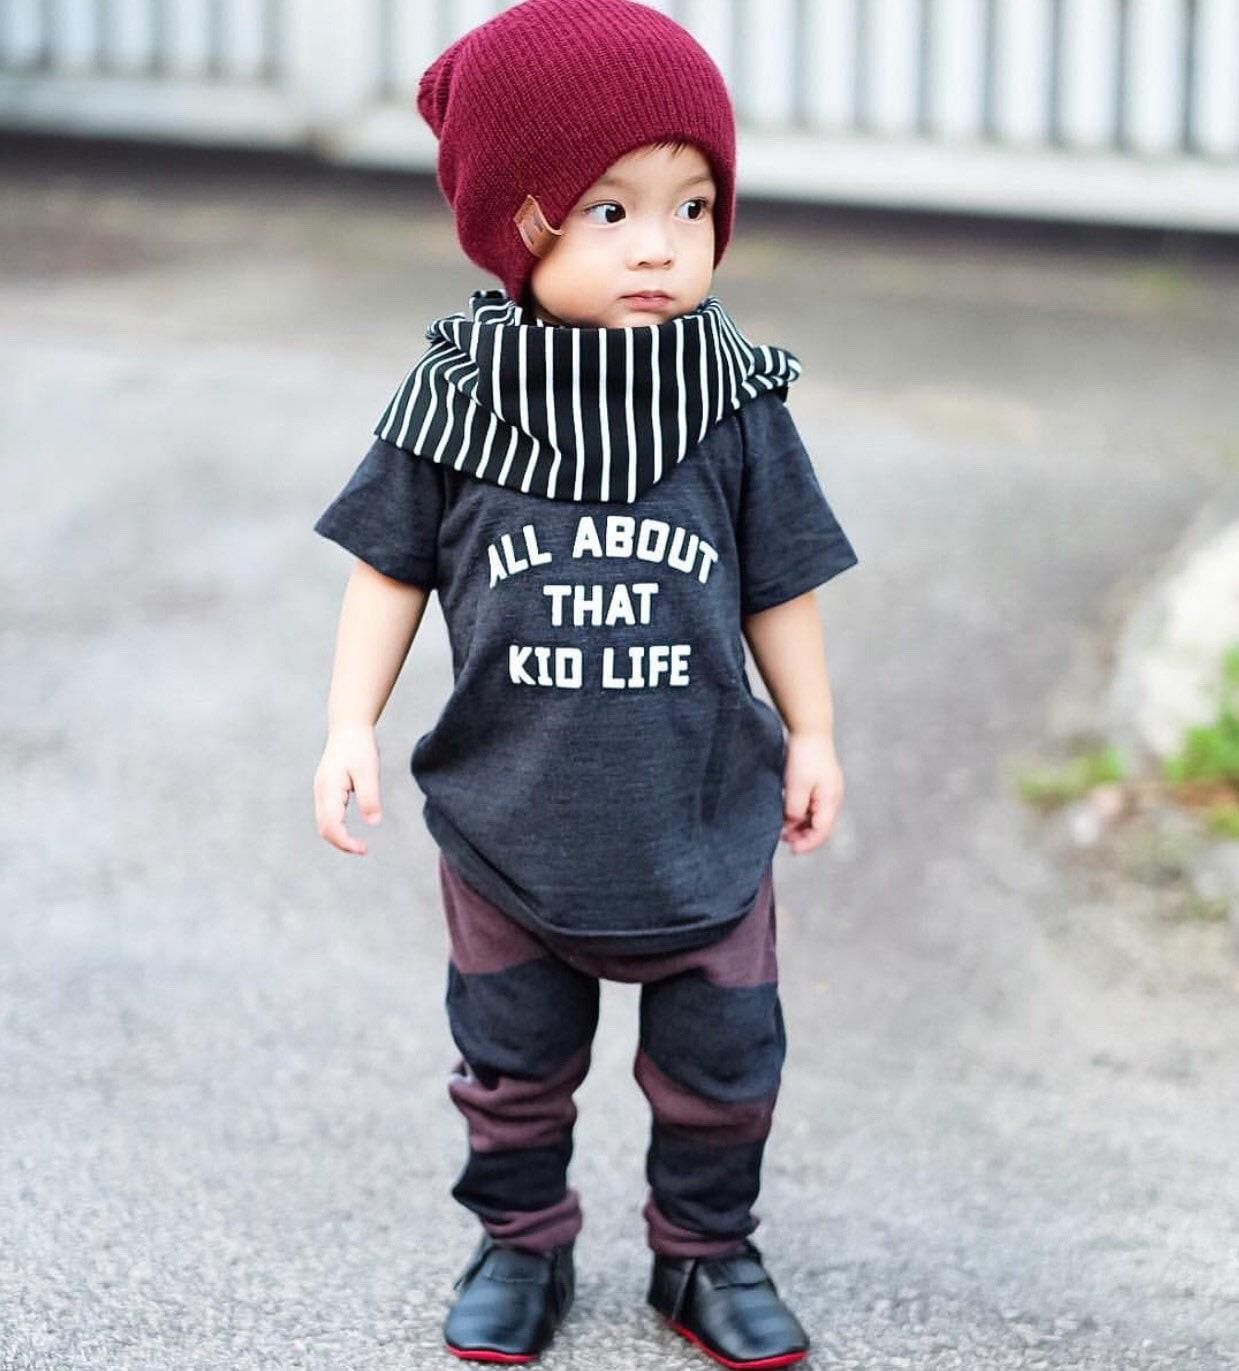 Kid Life Baby Shirt Phrase Quote Infant TShirt T-Shirt Top